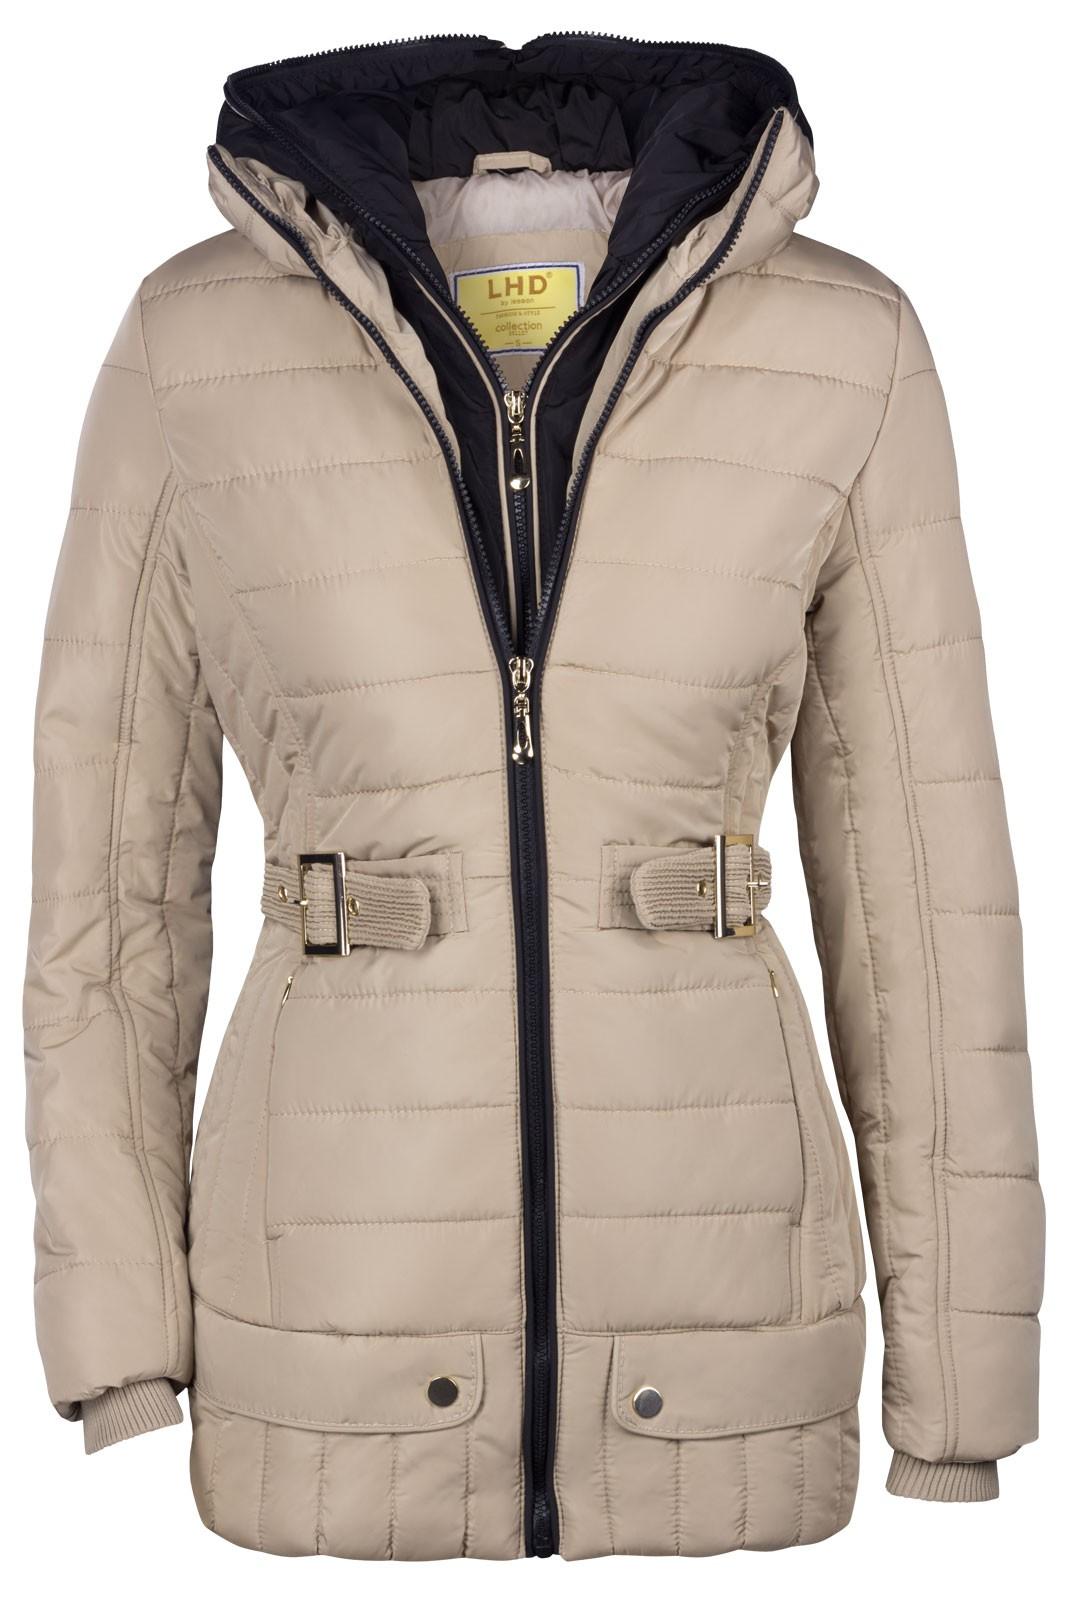 neu damen winter stepp parka mantel jacke 2in1 kapuze lang alaska ebay. Black Bedroom Furniture Sets. Home Design Ideas